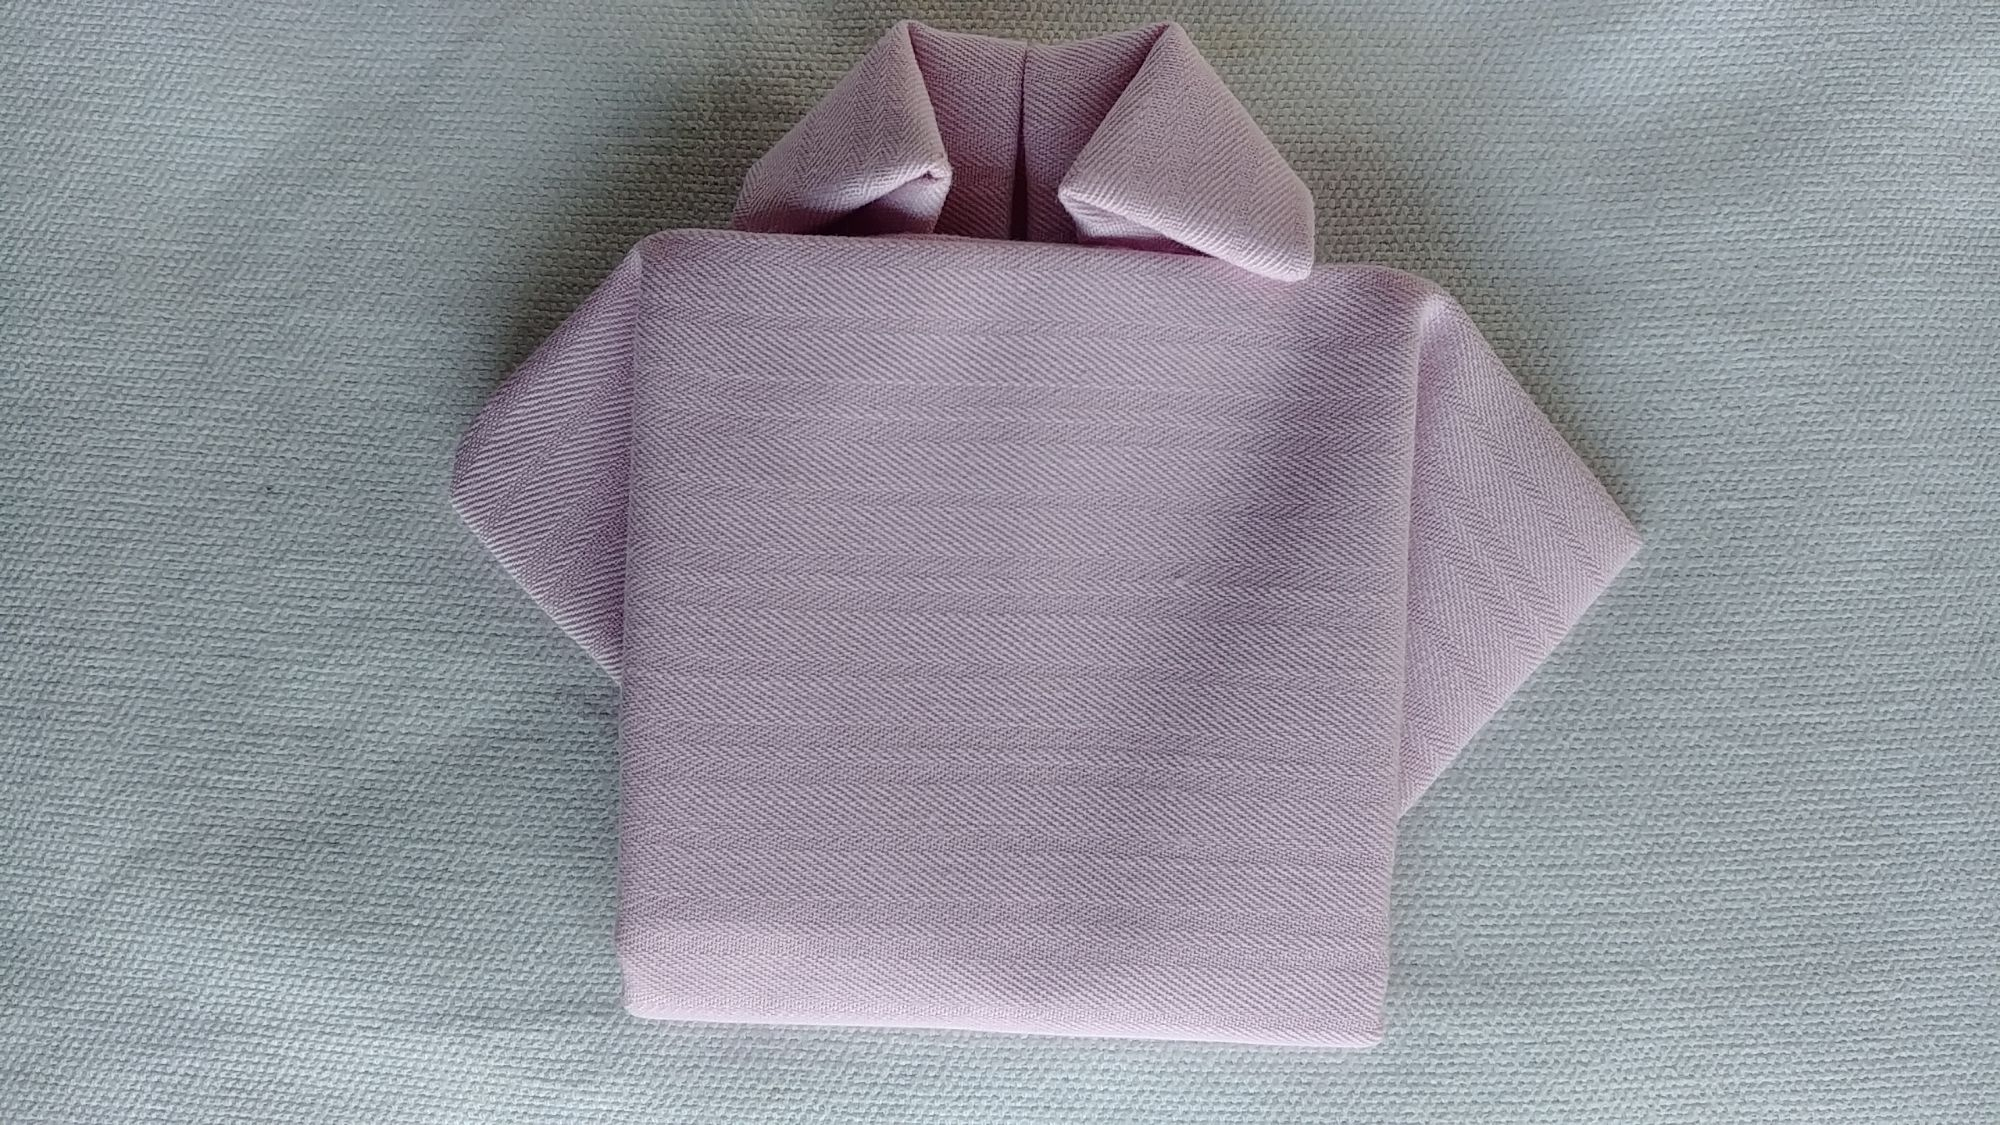 profumatore-oppure-segnaposto-origami-or2